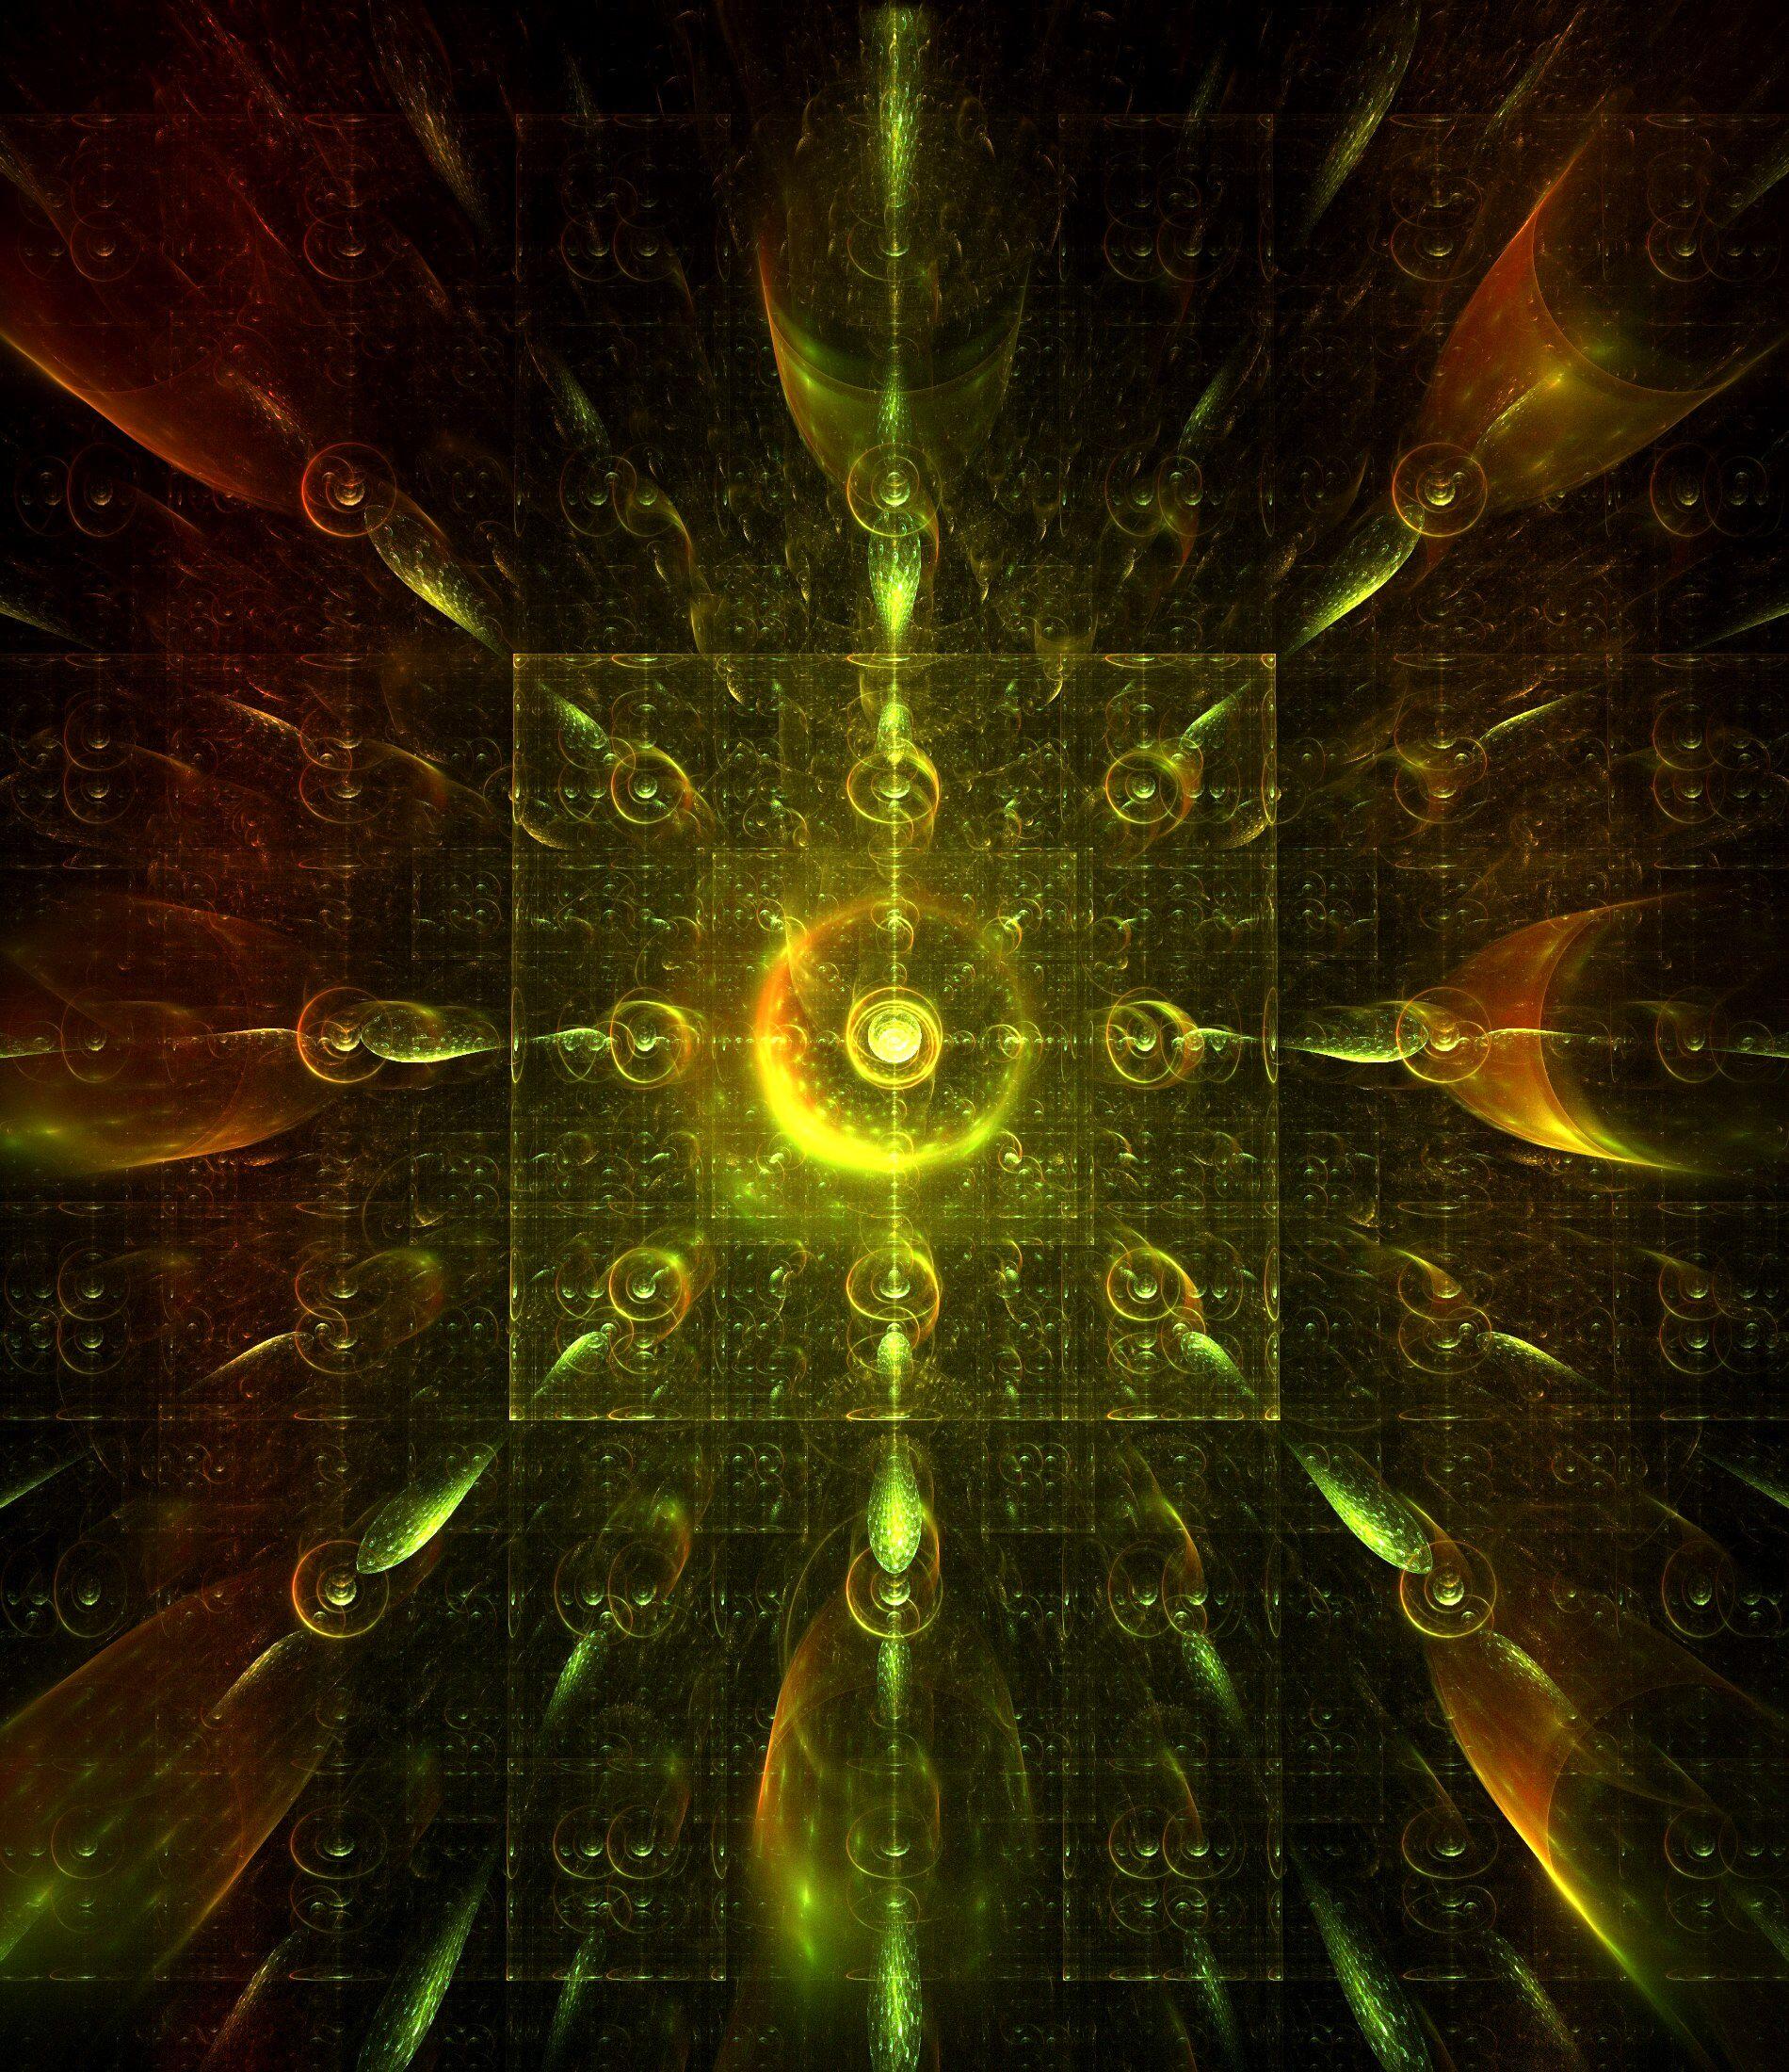 EVOLVING HOLOGRAM by DorianoArt